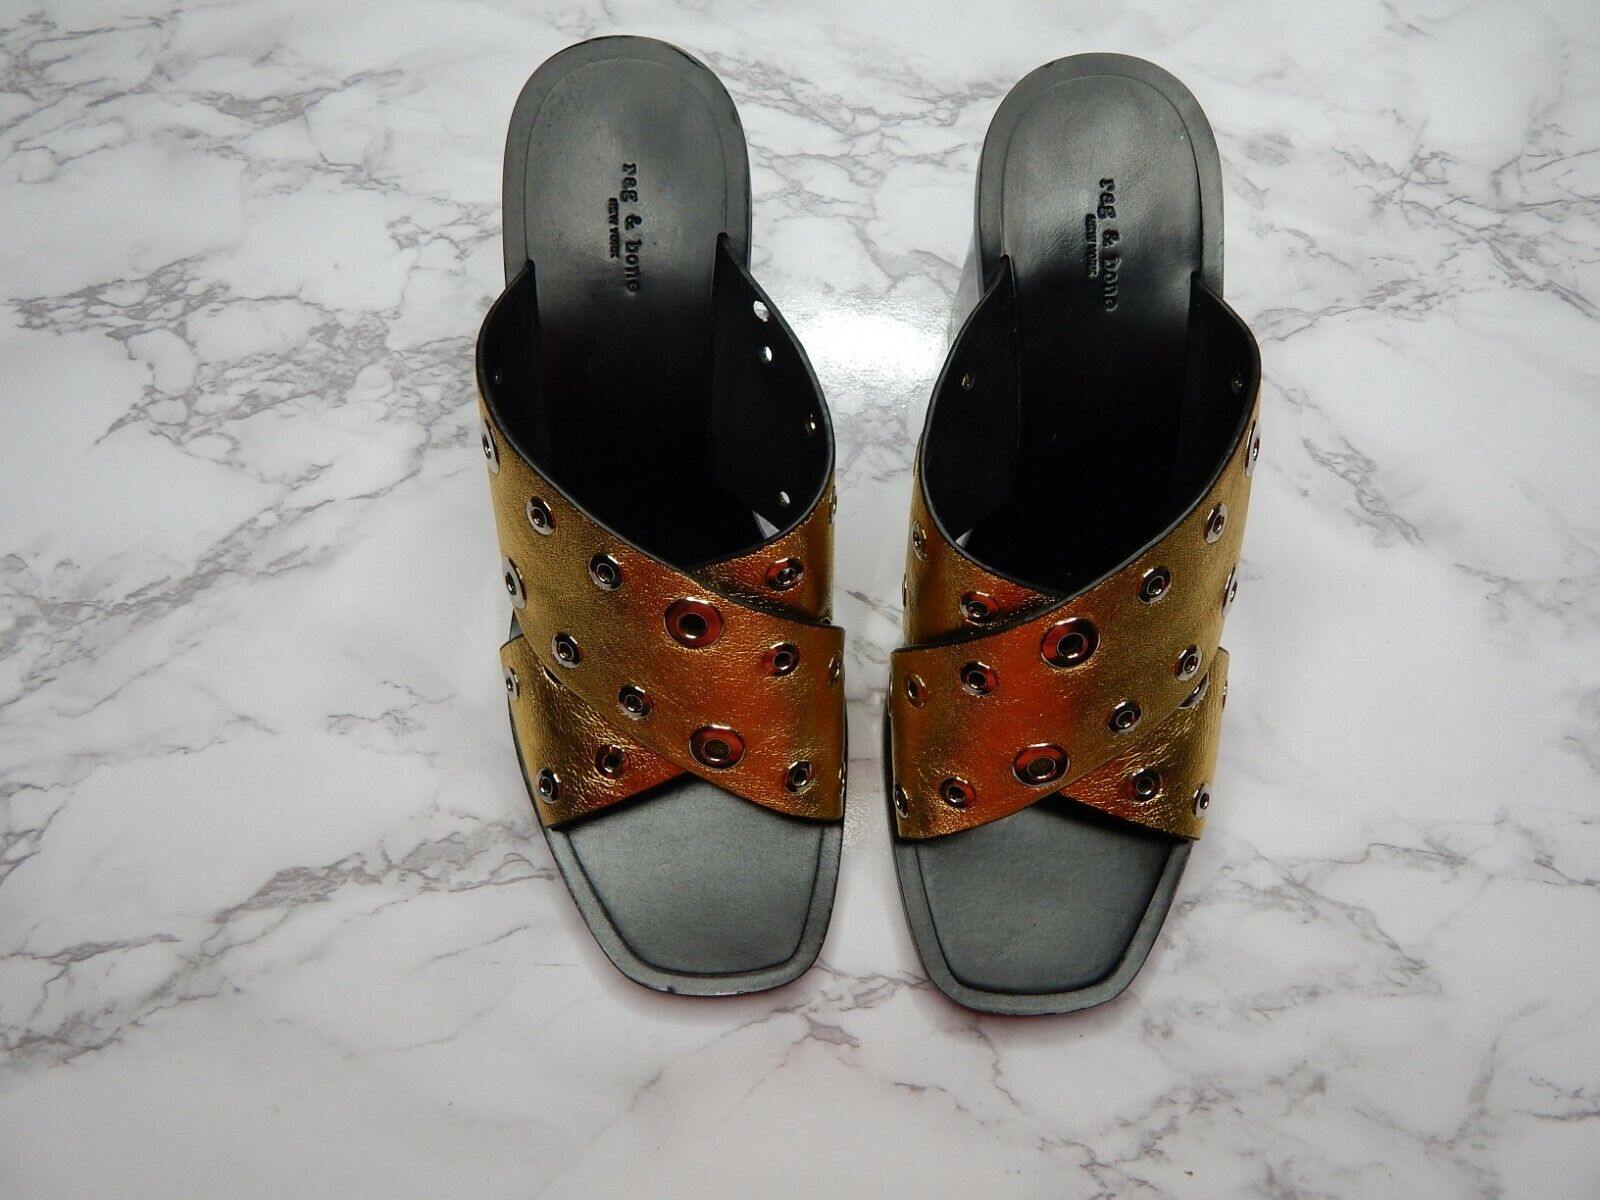 Rag Rag Rag och Bone Paige Criscross guld Slide Sandals Storlek 7 Reg. 495  fabriks direkt